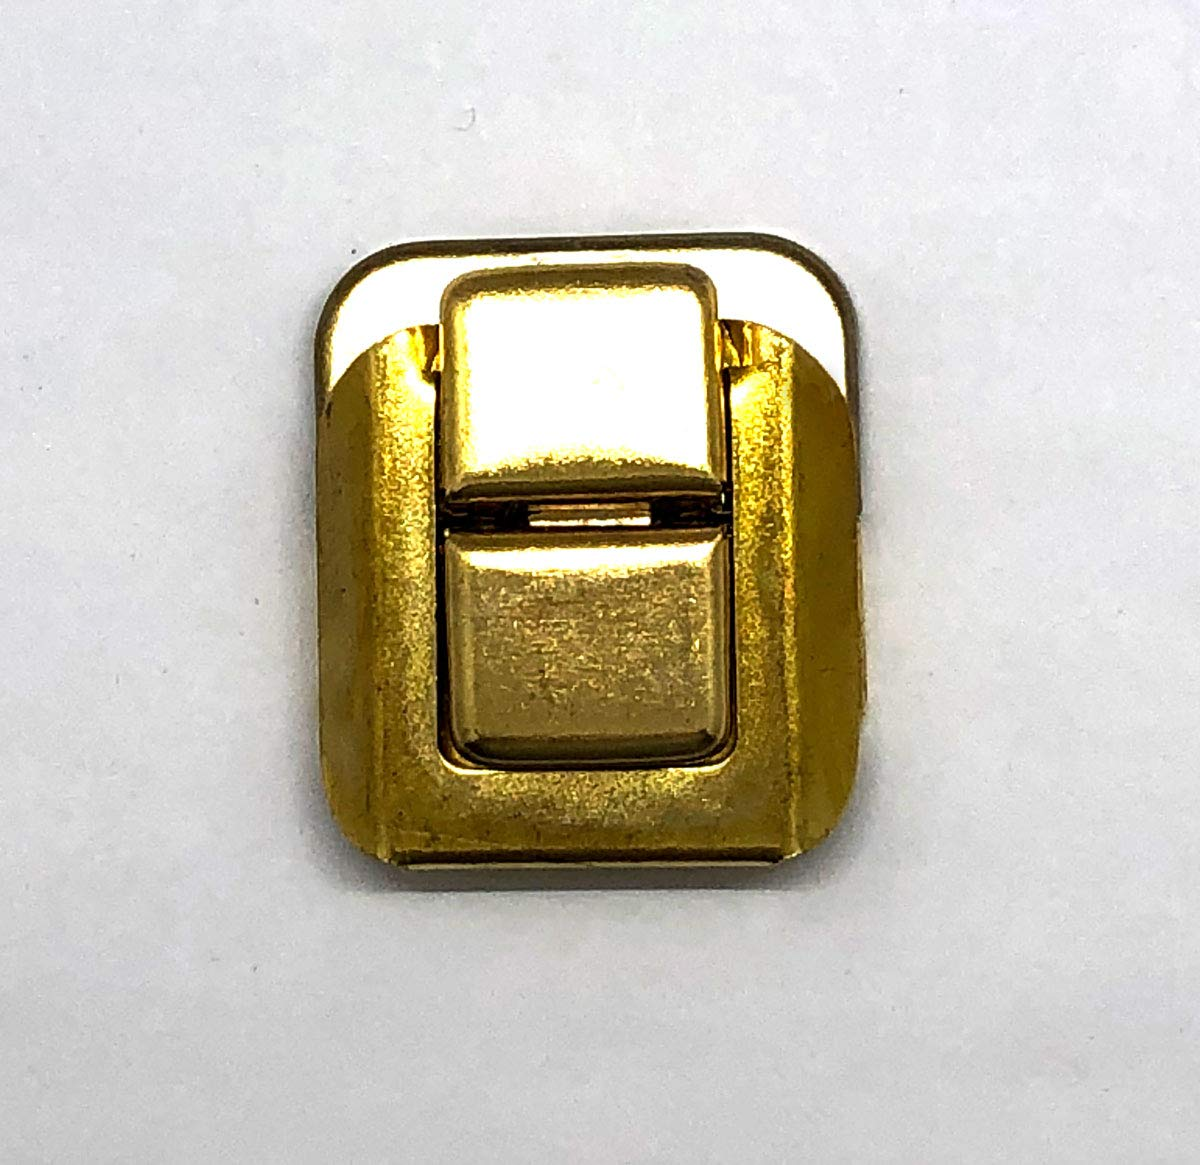 8 Small Box Lid Hidden Hole Latch/Catch Brass Plate W/Screws